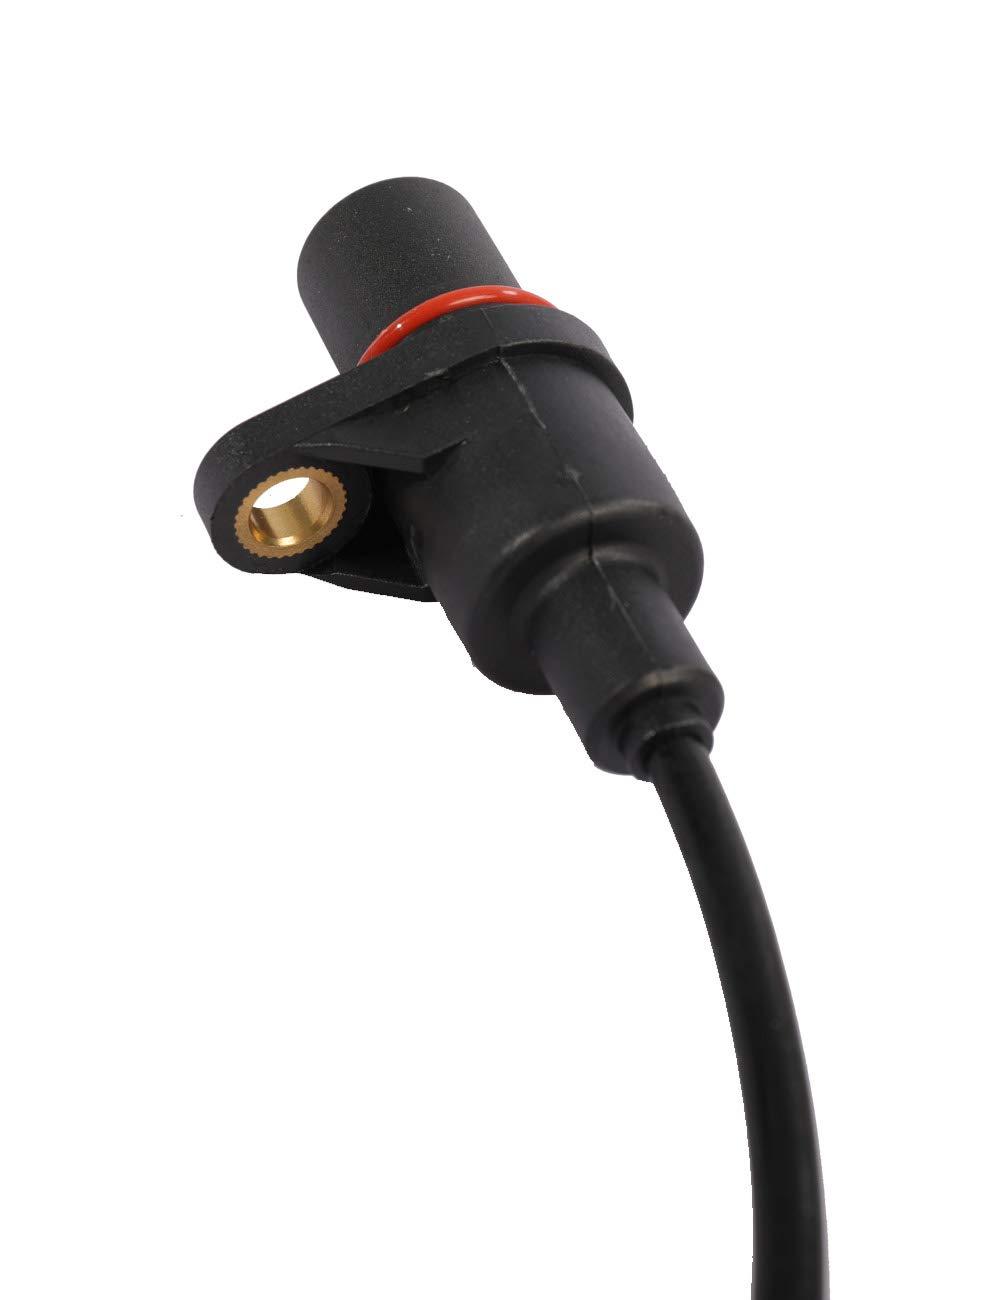 ZHQIAO New 1 Pcs CPS Vehicle Sensor for Hyundai Accent Kia Rio Rio5 2003 2004 2005 2006 2007 2008 2009 2010 2011 3918022600 Crankshaft Position Sensor